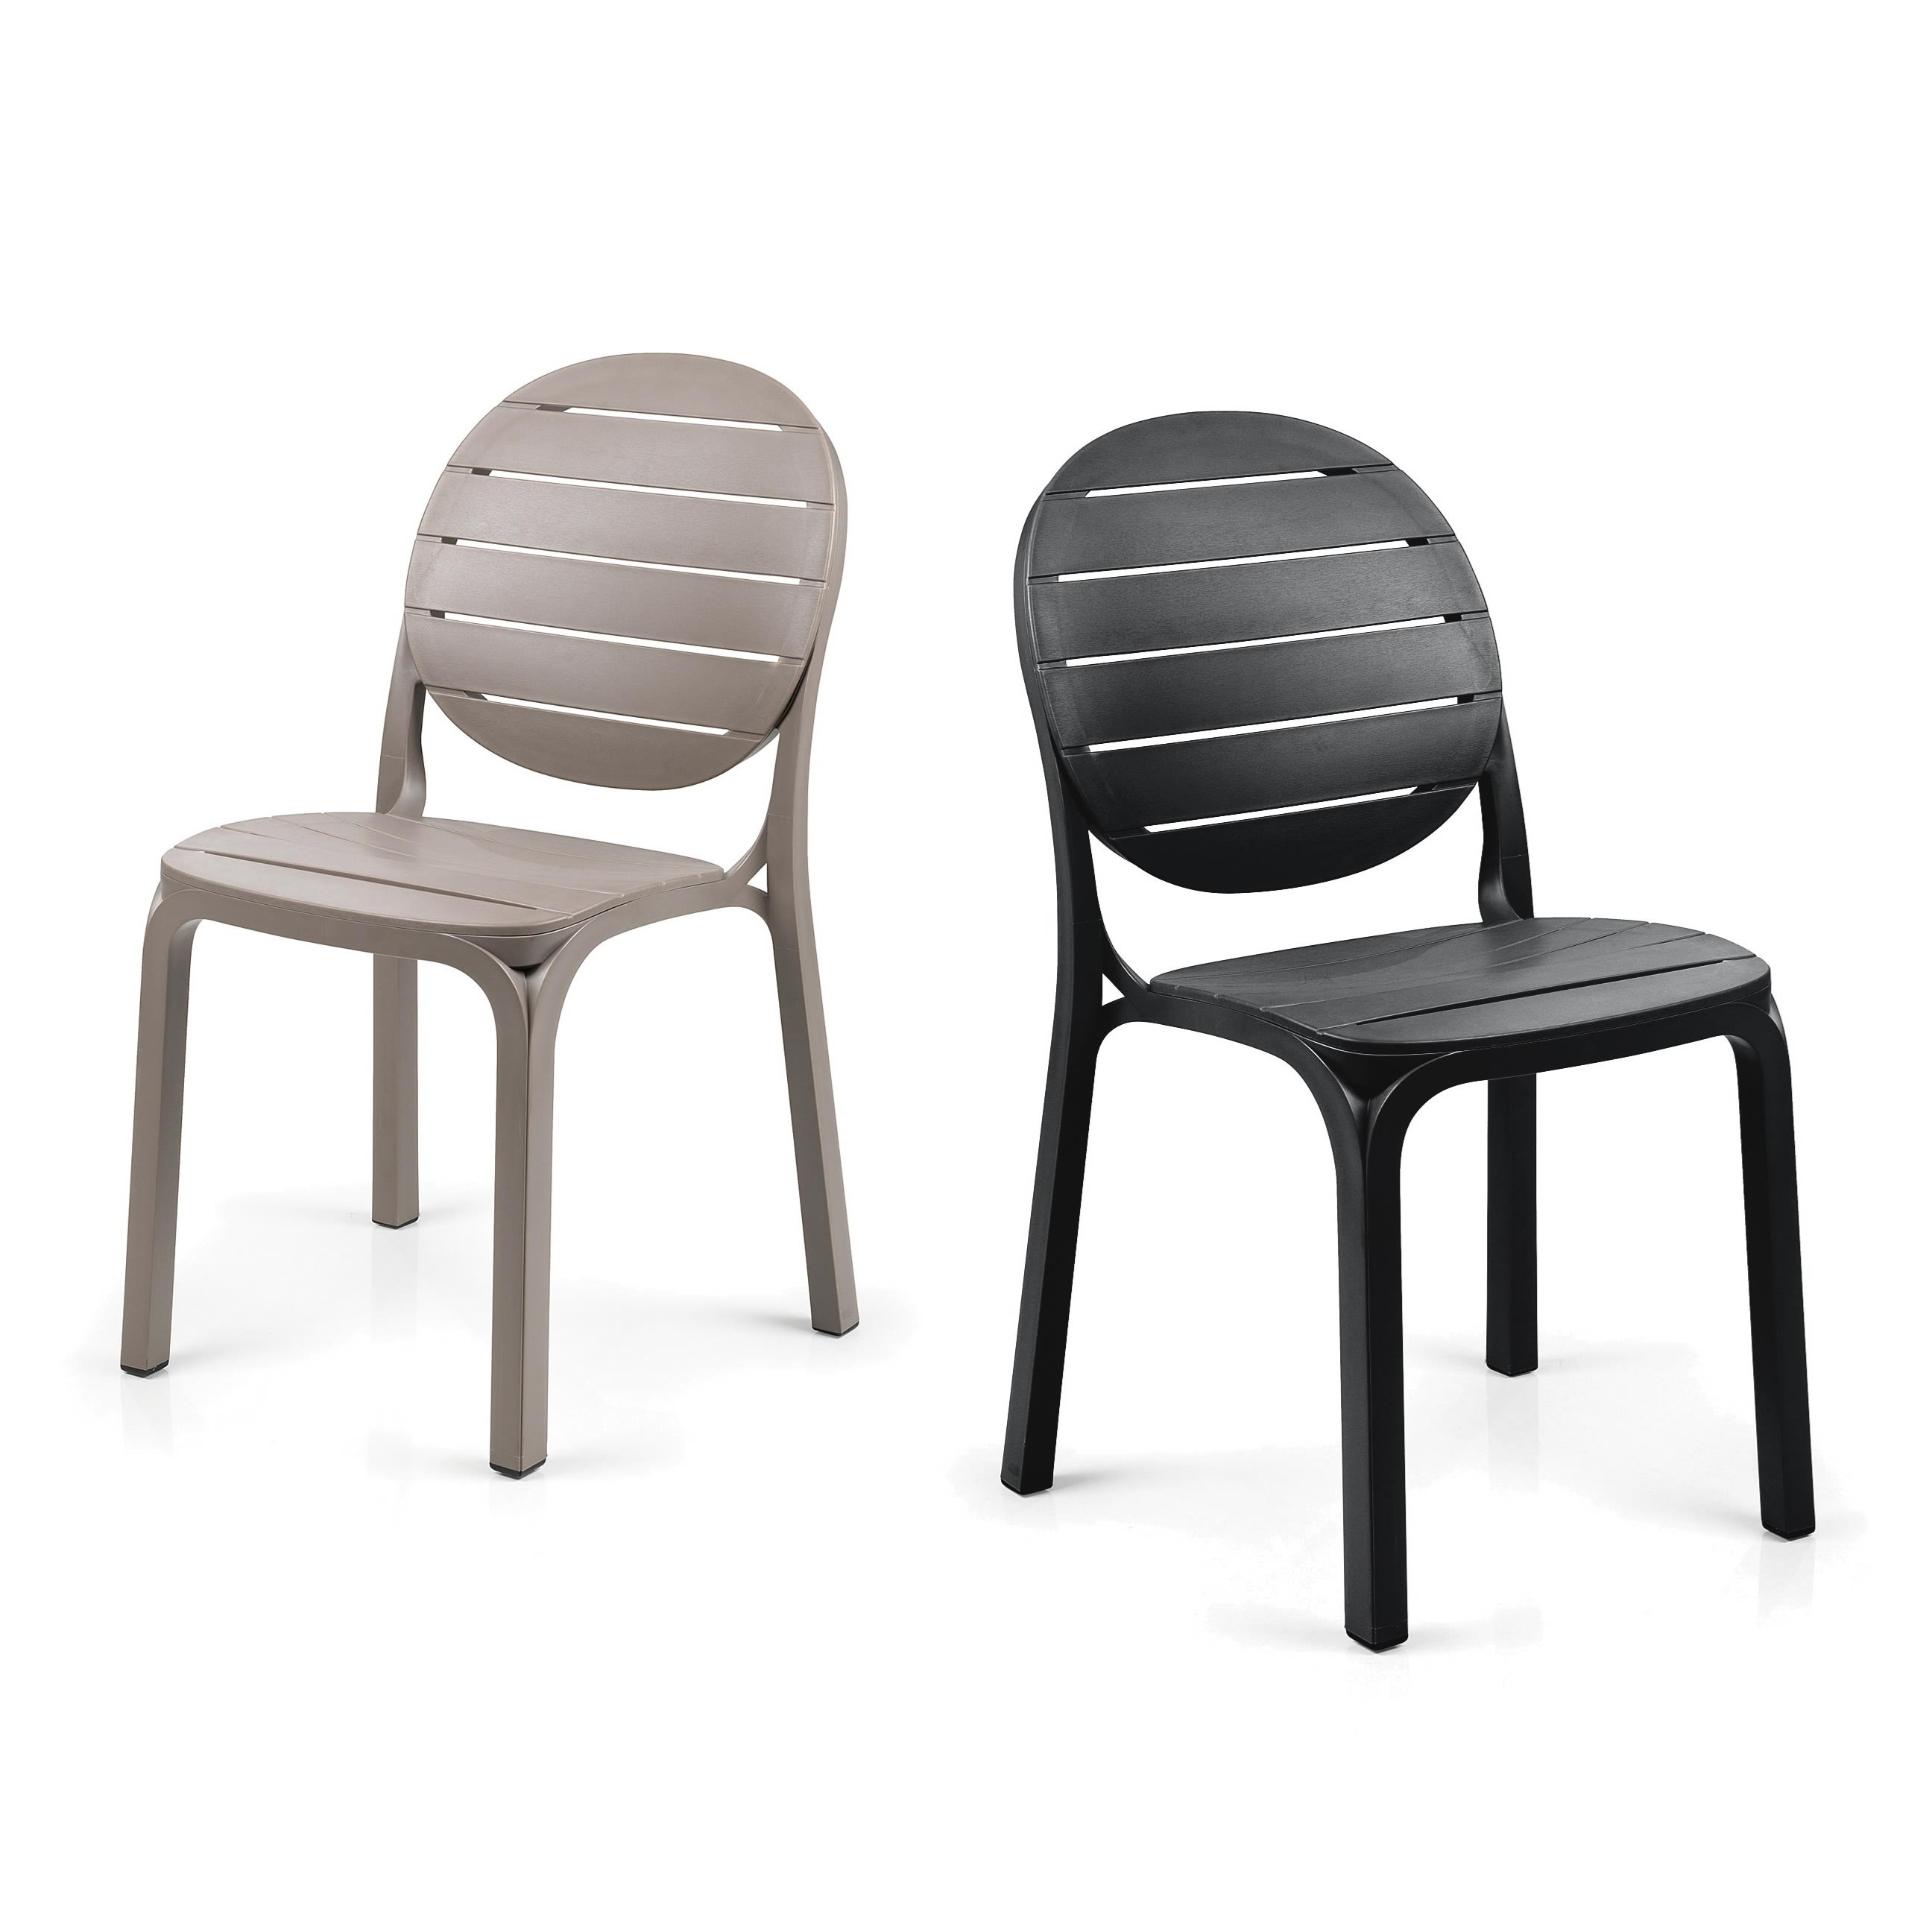 Sedia per esterni in resina erica nardi for Divisori da giardino in plastica